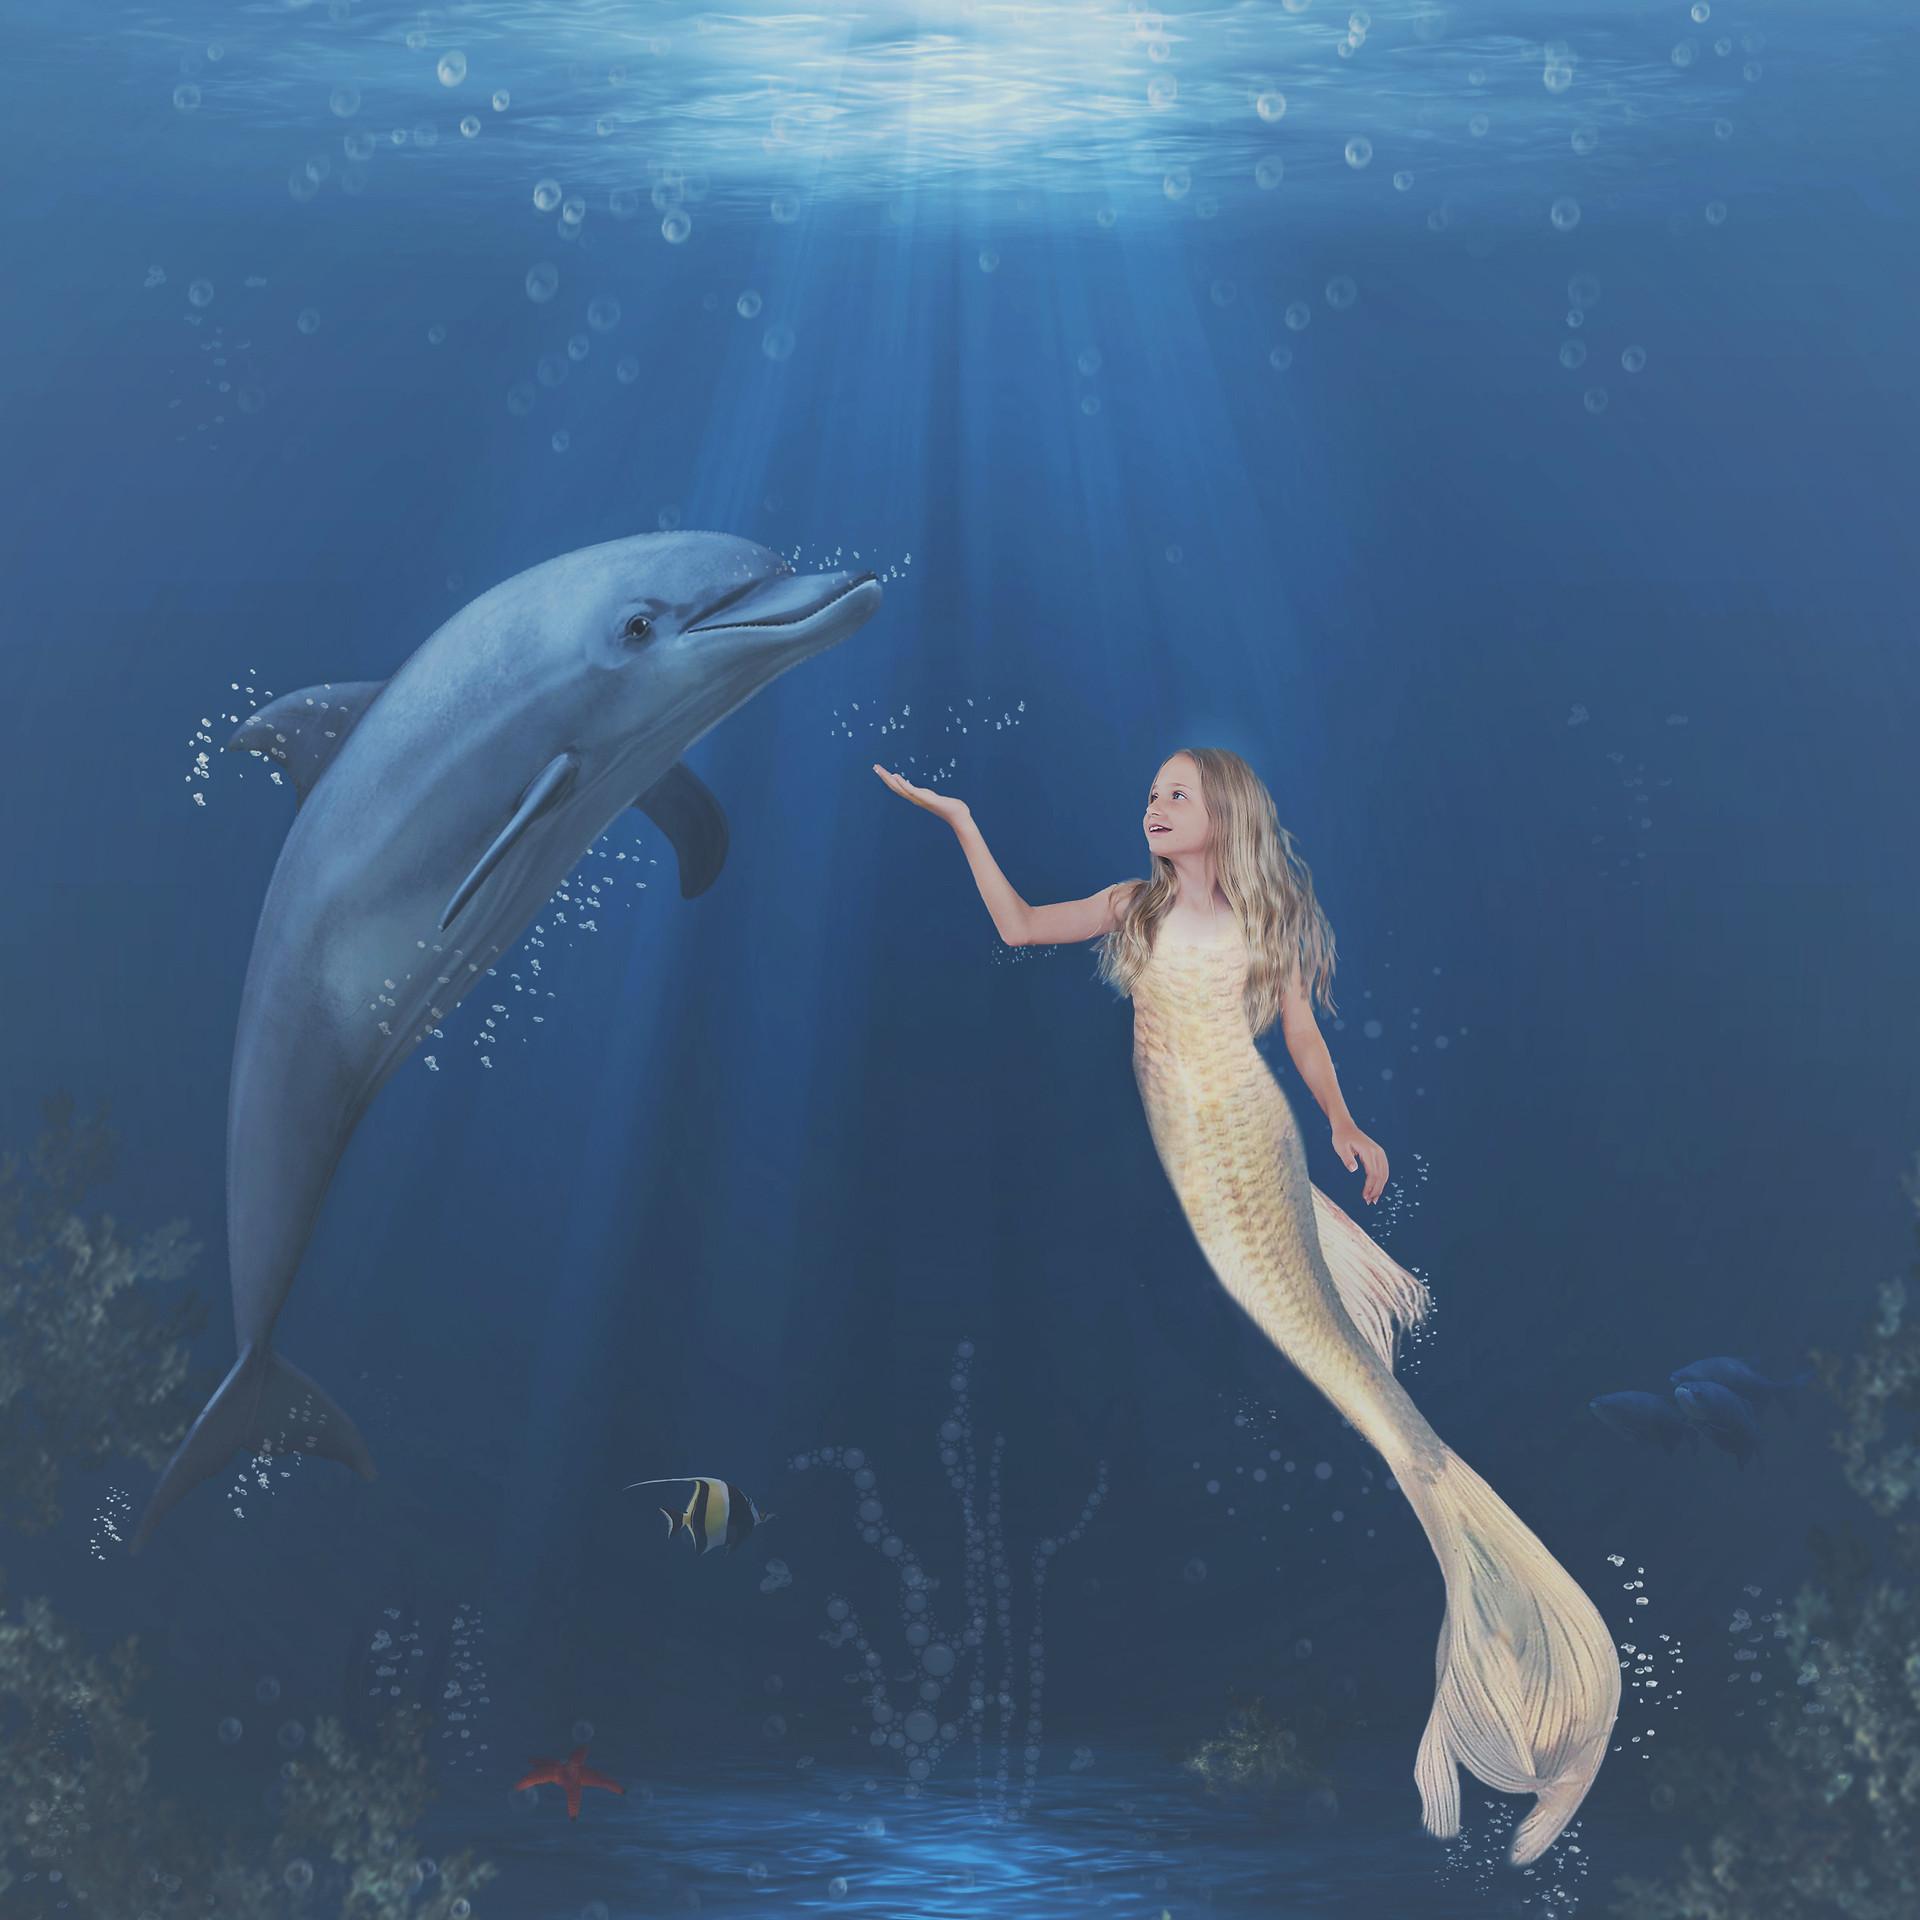 Ava and dolphin Final. Creative Children's Photography fantasy photoshoot, Dream Alice Photography & Art, Gold Coast